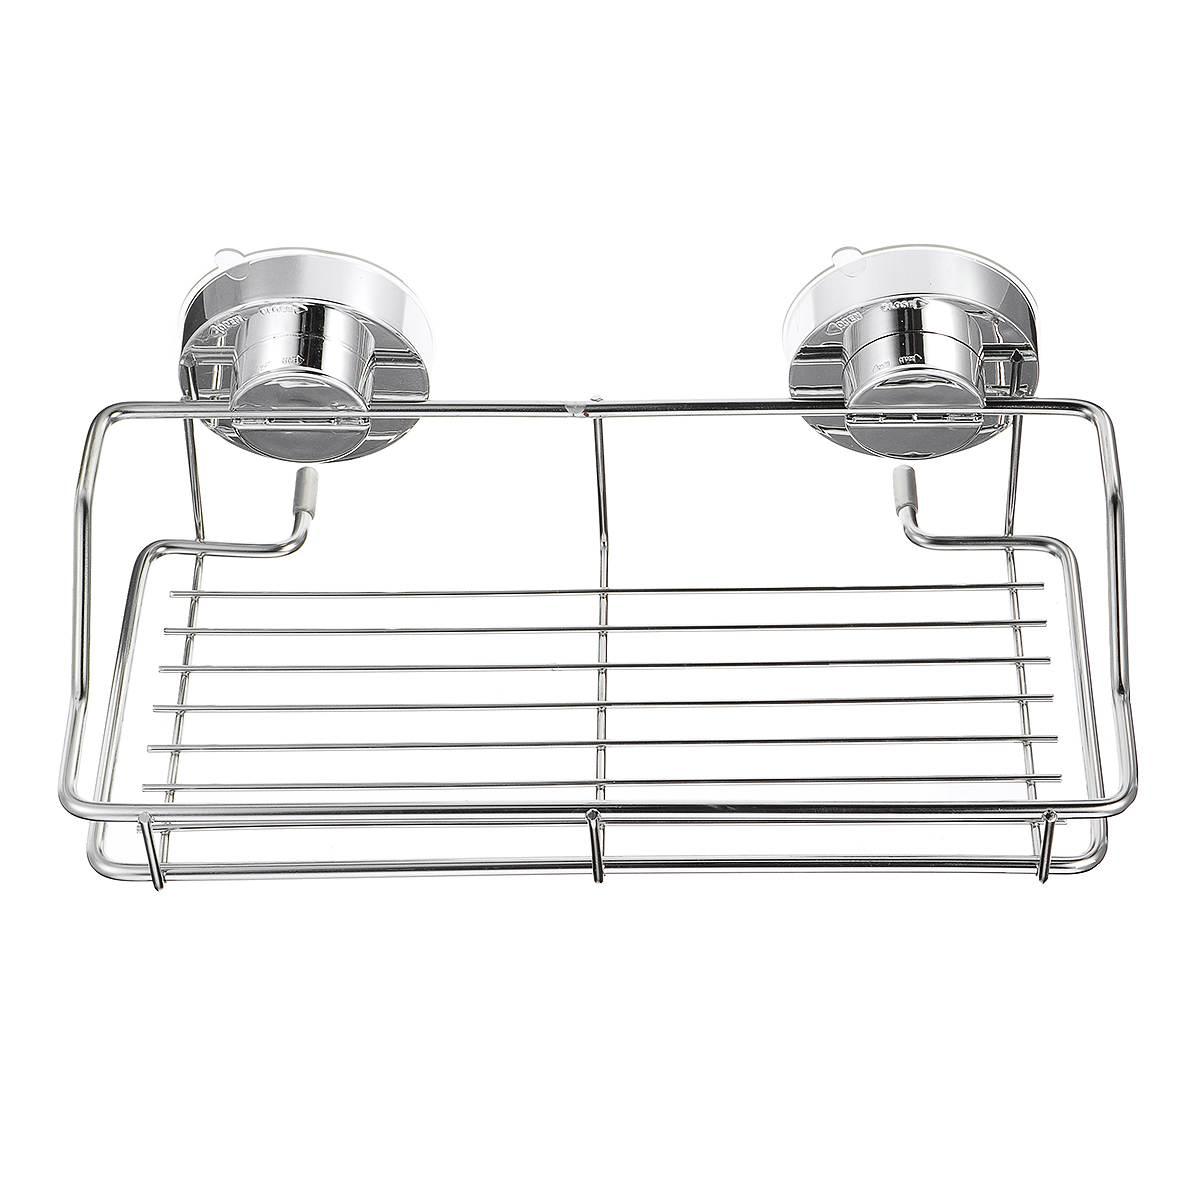 Bathroom Shower Rack Shelf Basket Stainless Steel Shower Caddy//Organiser suction